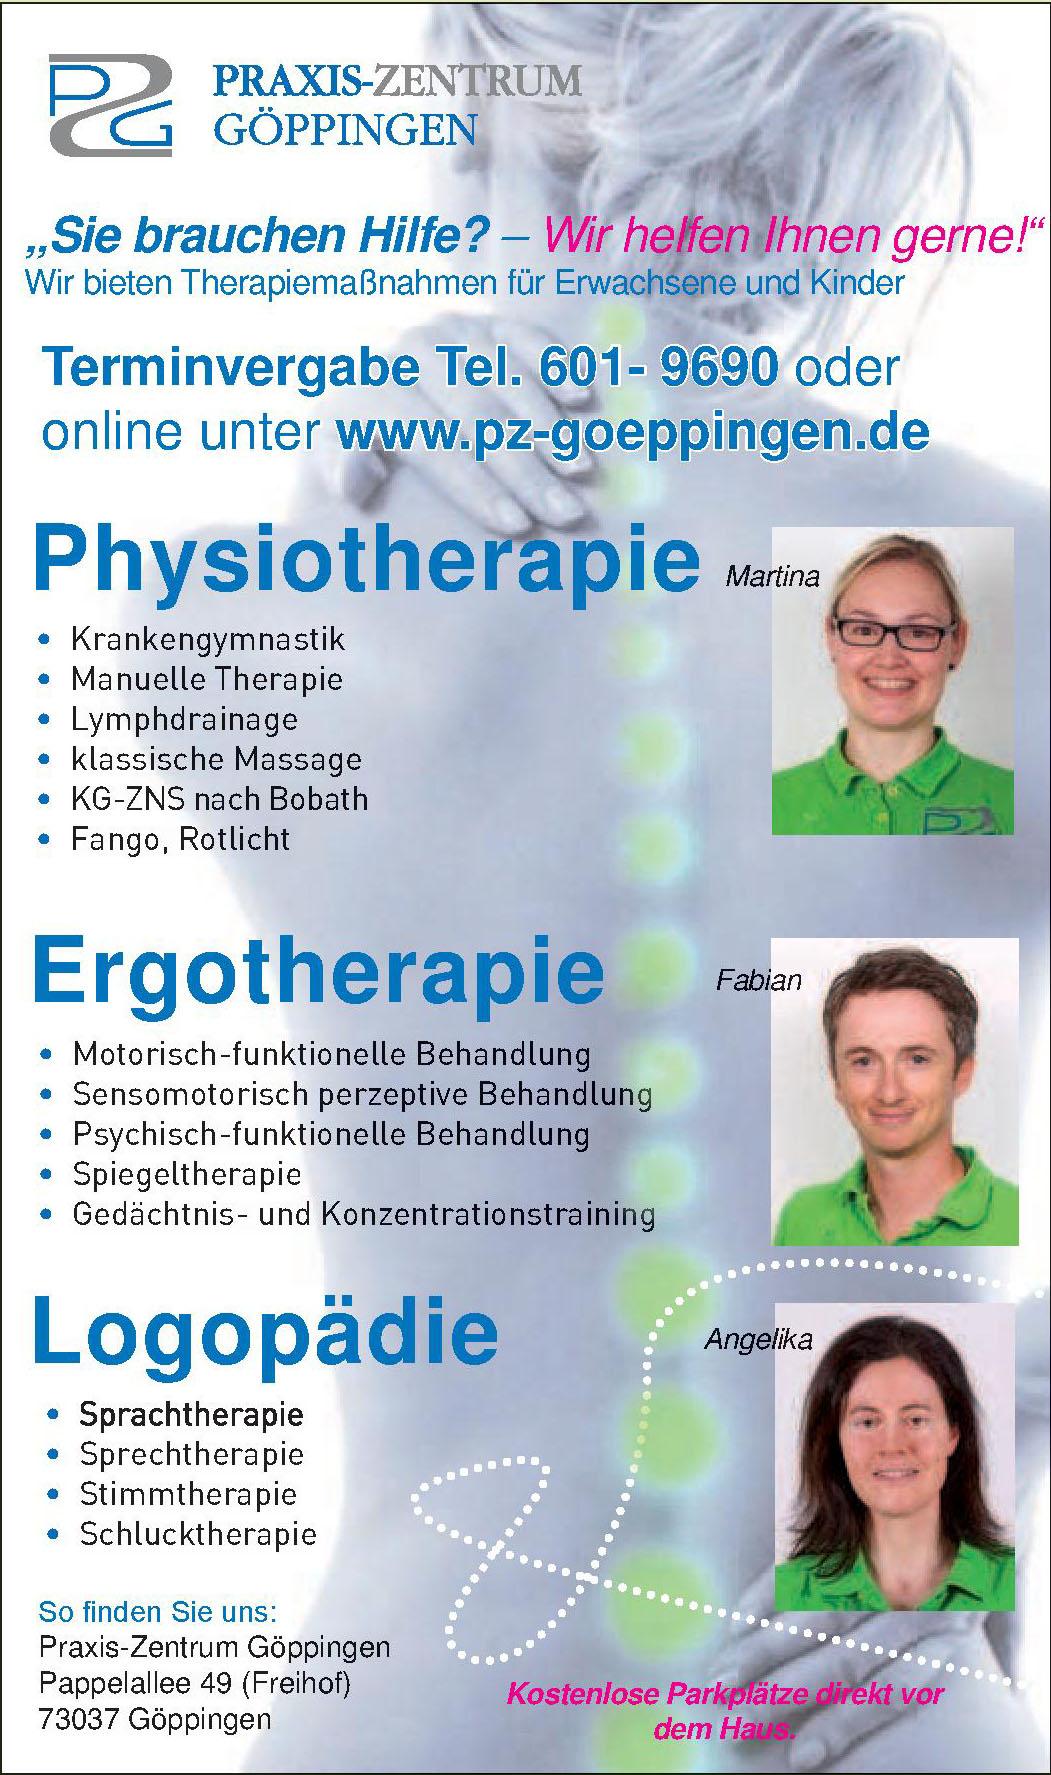 PZG - Praxis-Zentrum Göppingen